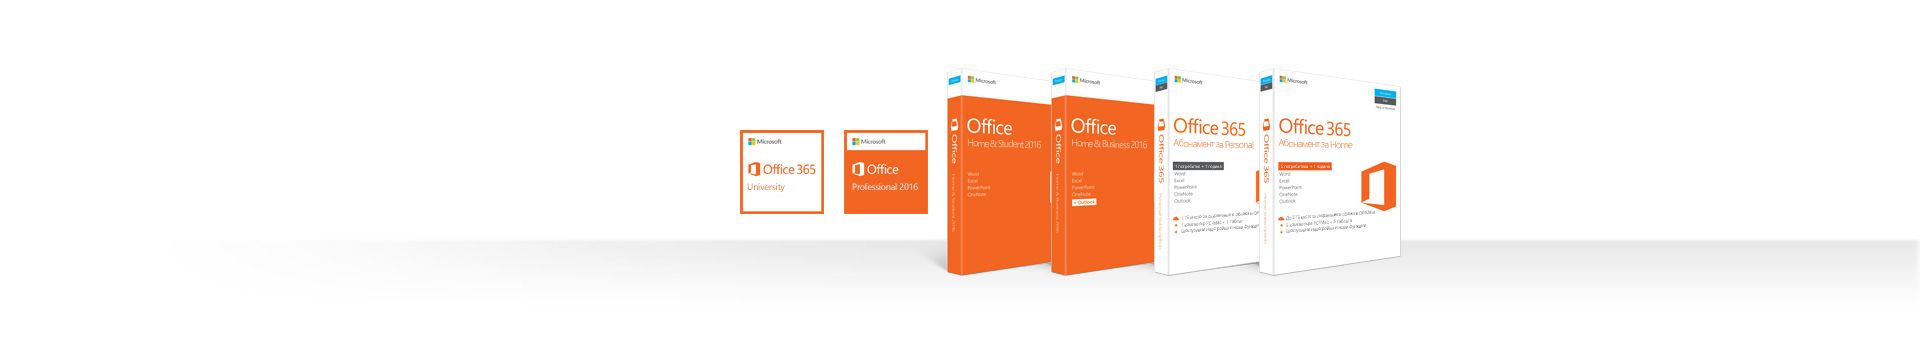 Ред правоъгълници с продуктите на Office 2016 и Office 365 за PC